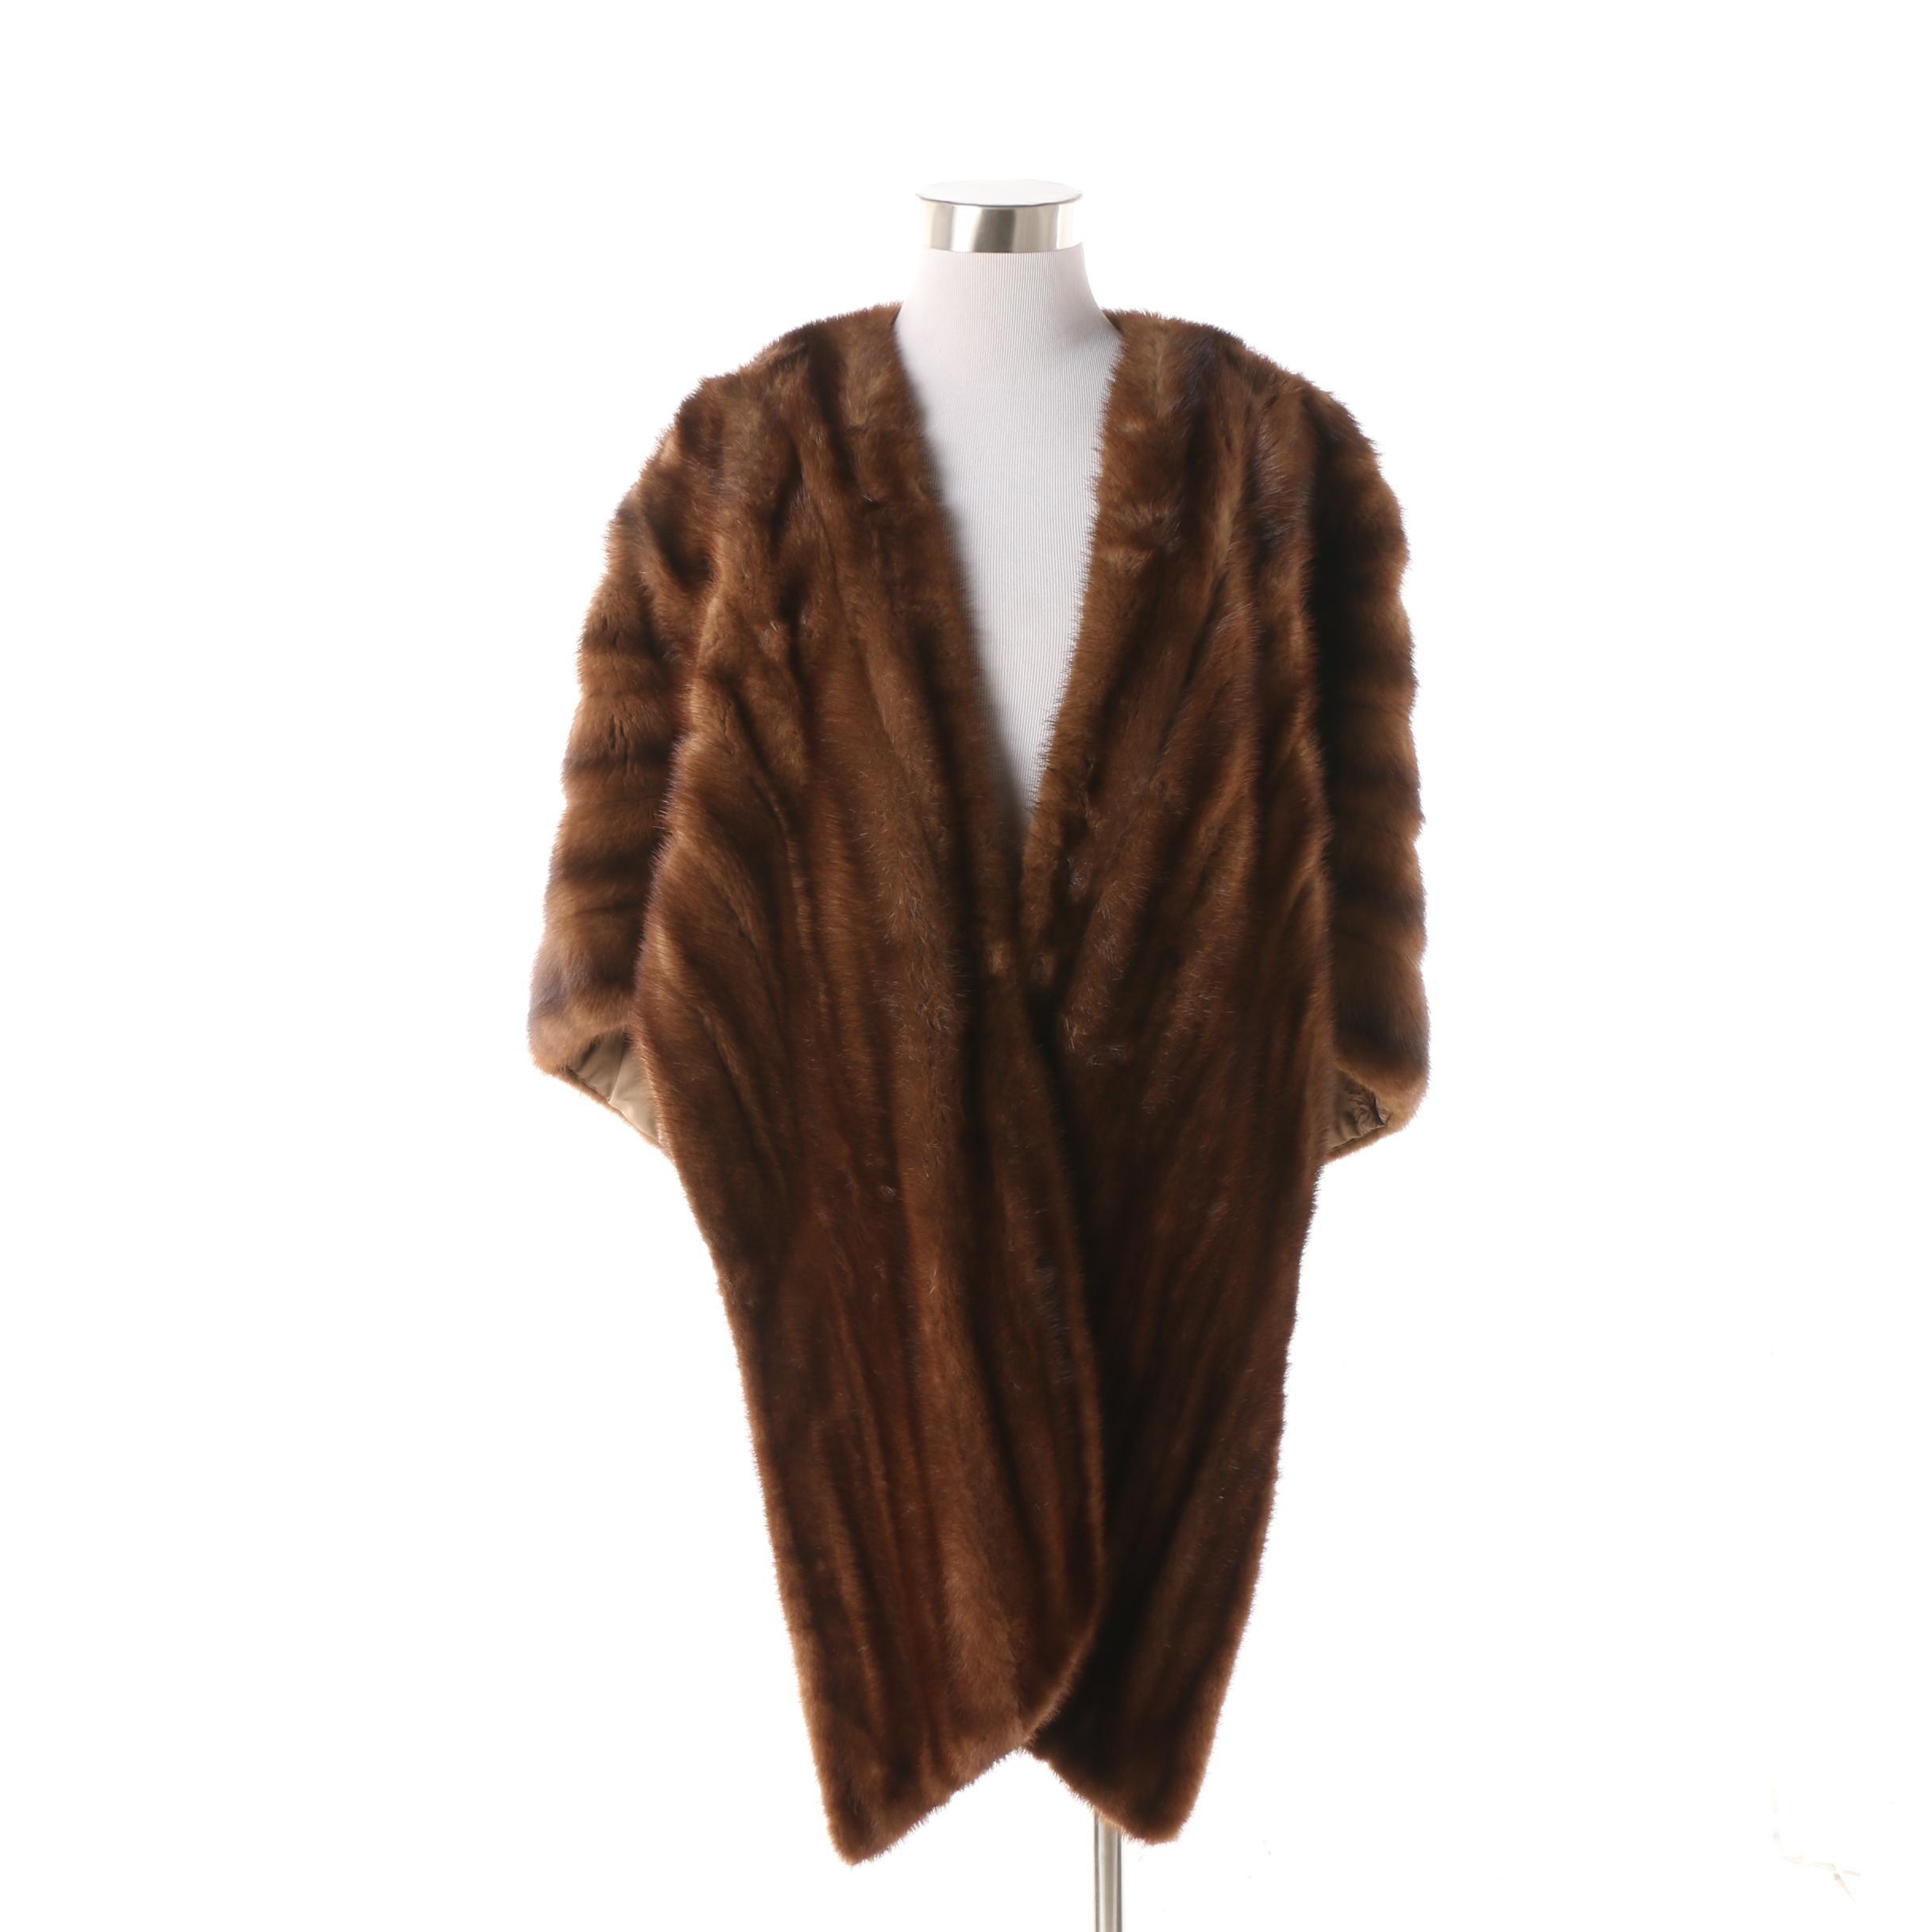 Women's Vintage Slatkin Furs New York Mink Fur Stole